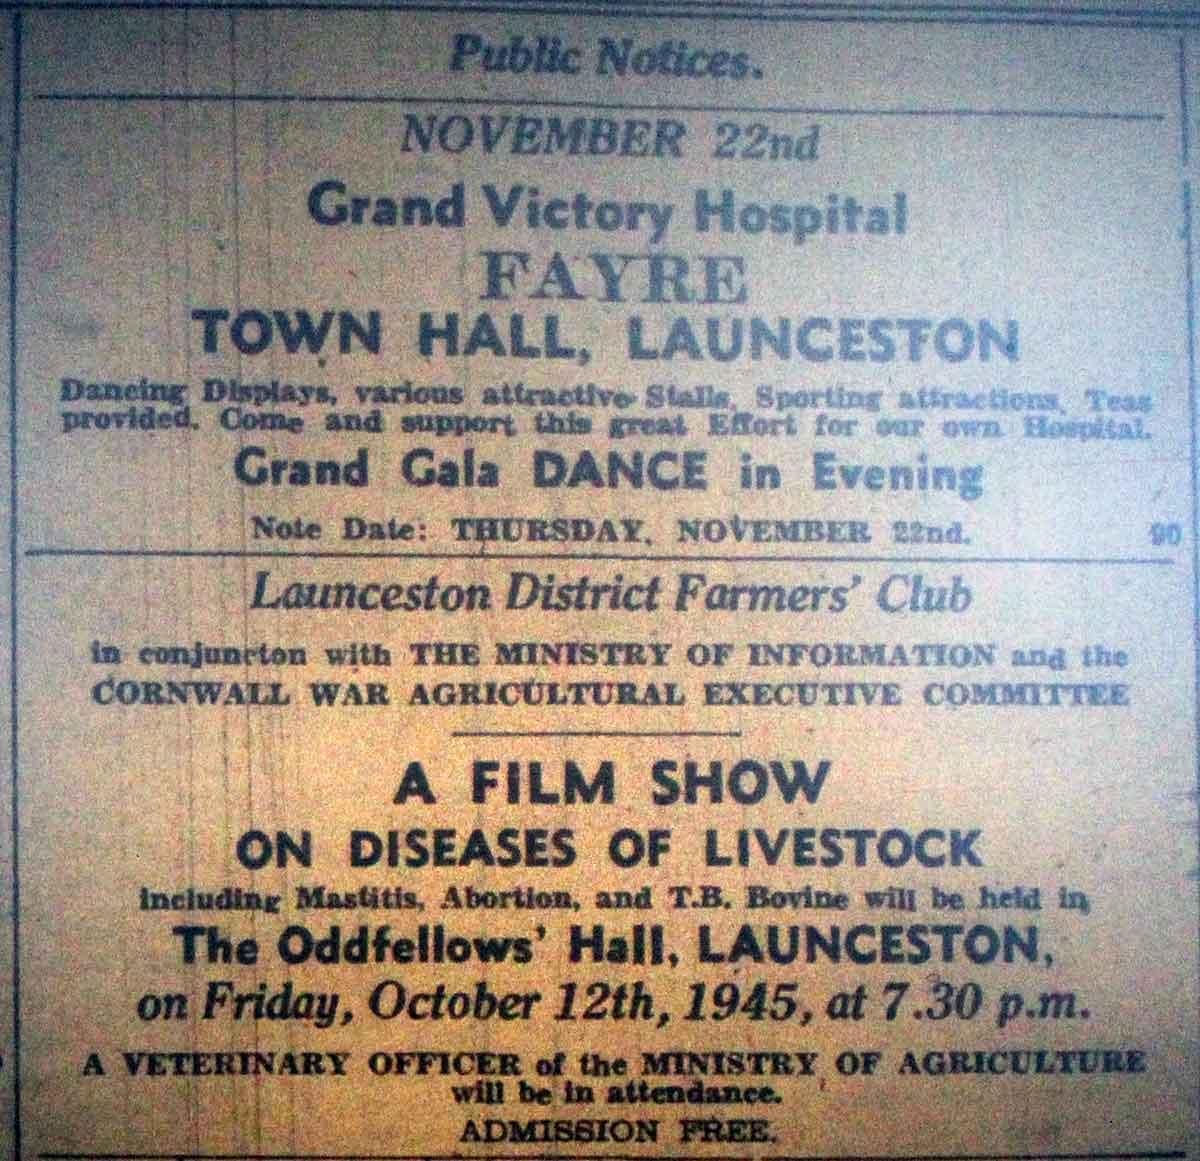 grand-victory-hospital-fayre-advert-october-1945